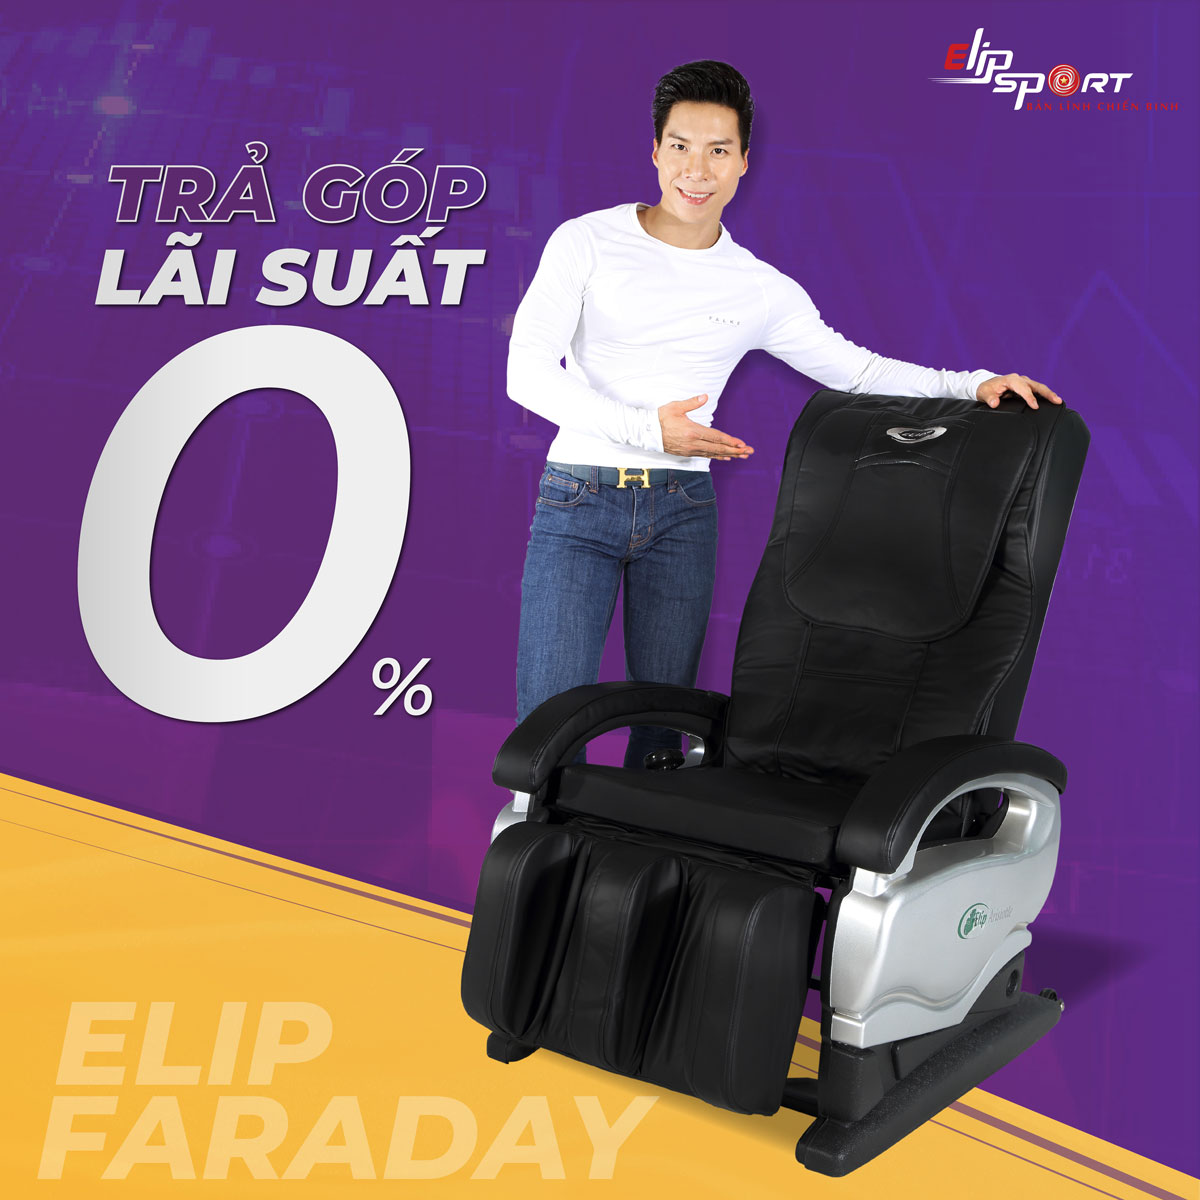 Ghế massage ELIP Faraday